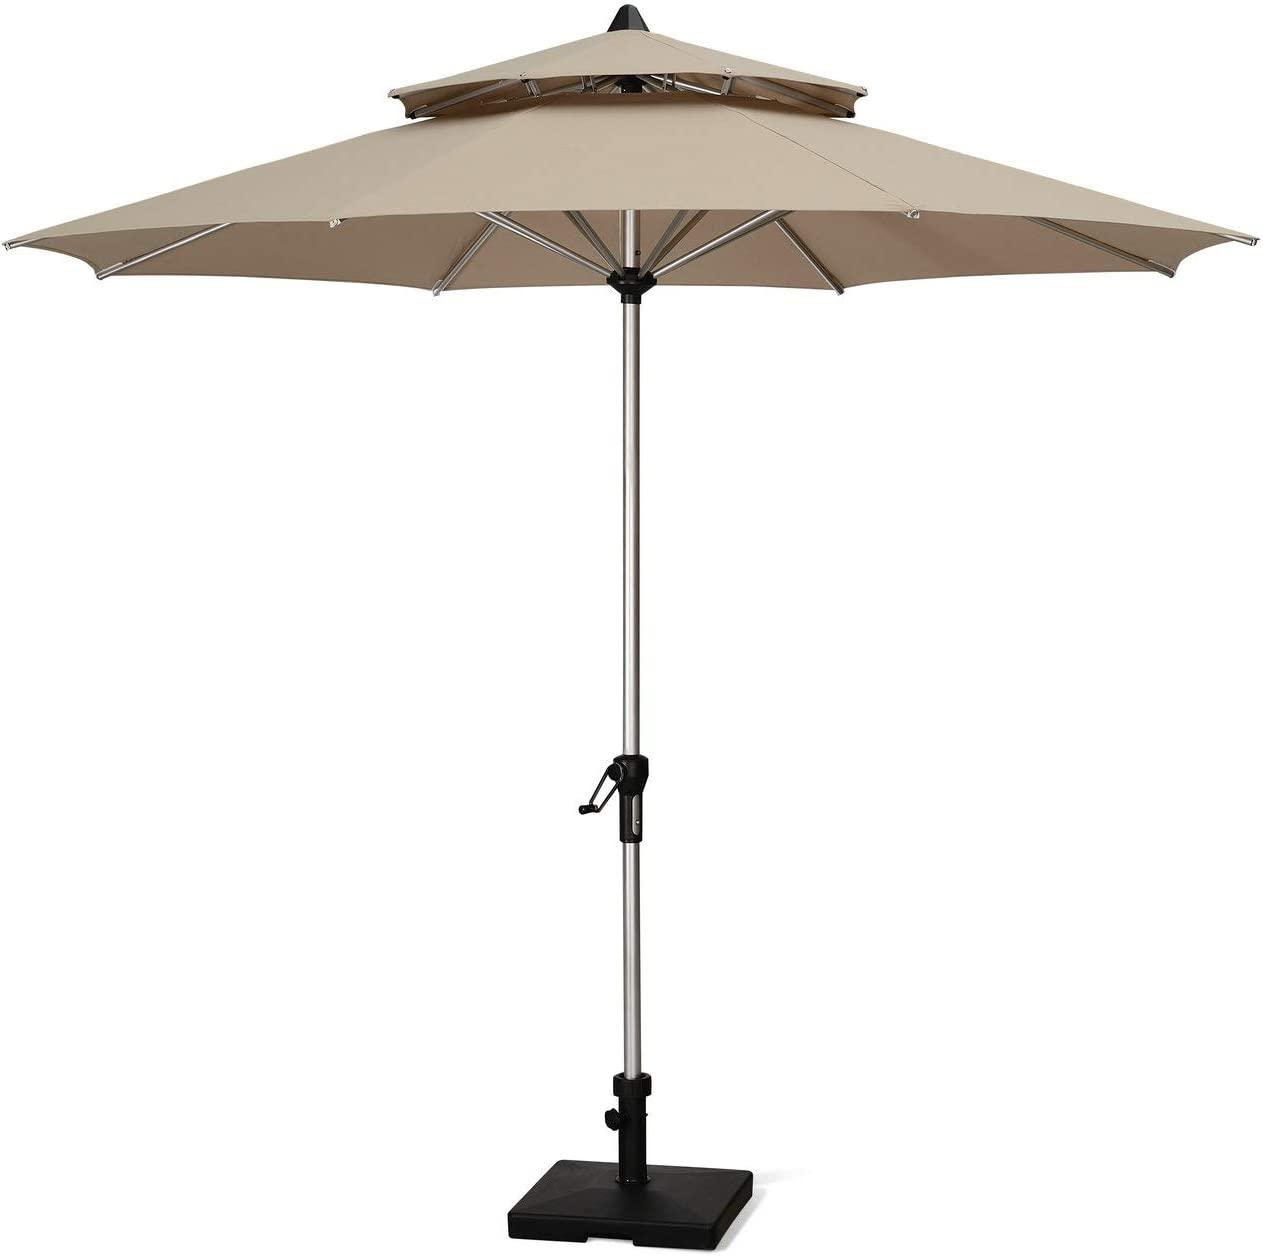 PURPLE LEAF 9 Feet Double Top Deluxe Sunbrella Patio Umbrella Outdoor Market Umbrella Garden Umbrella, Beige